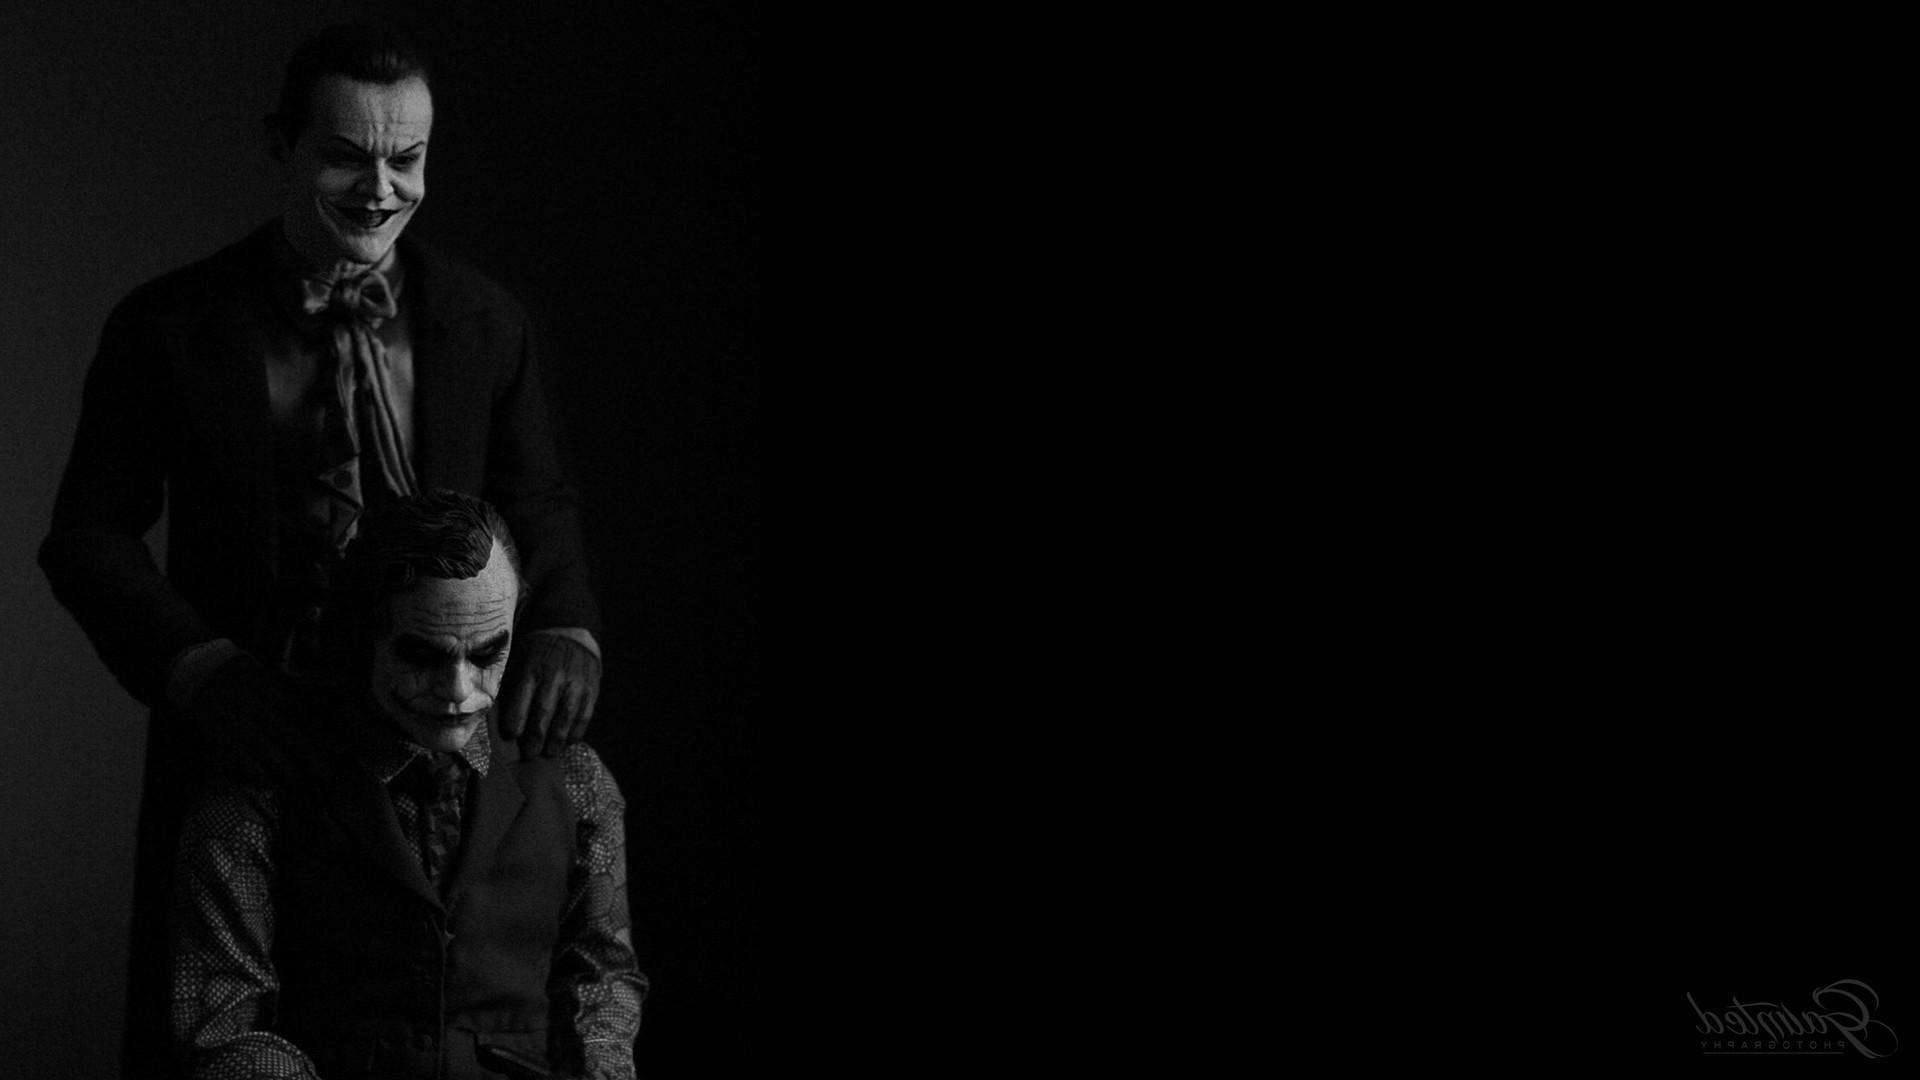 Joker, The Dark Knight, Batman, Heath Ledger, Jack Nicholson, Black  Background